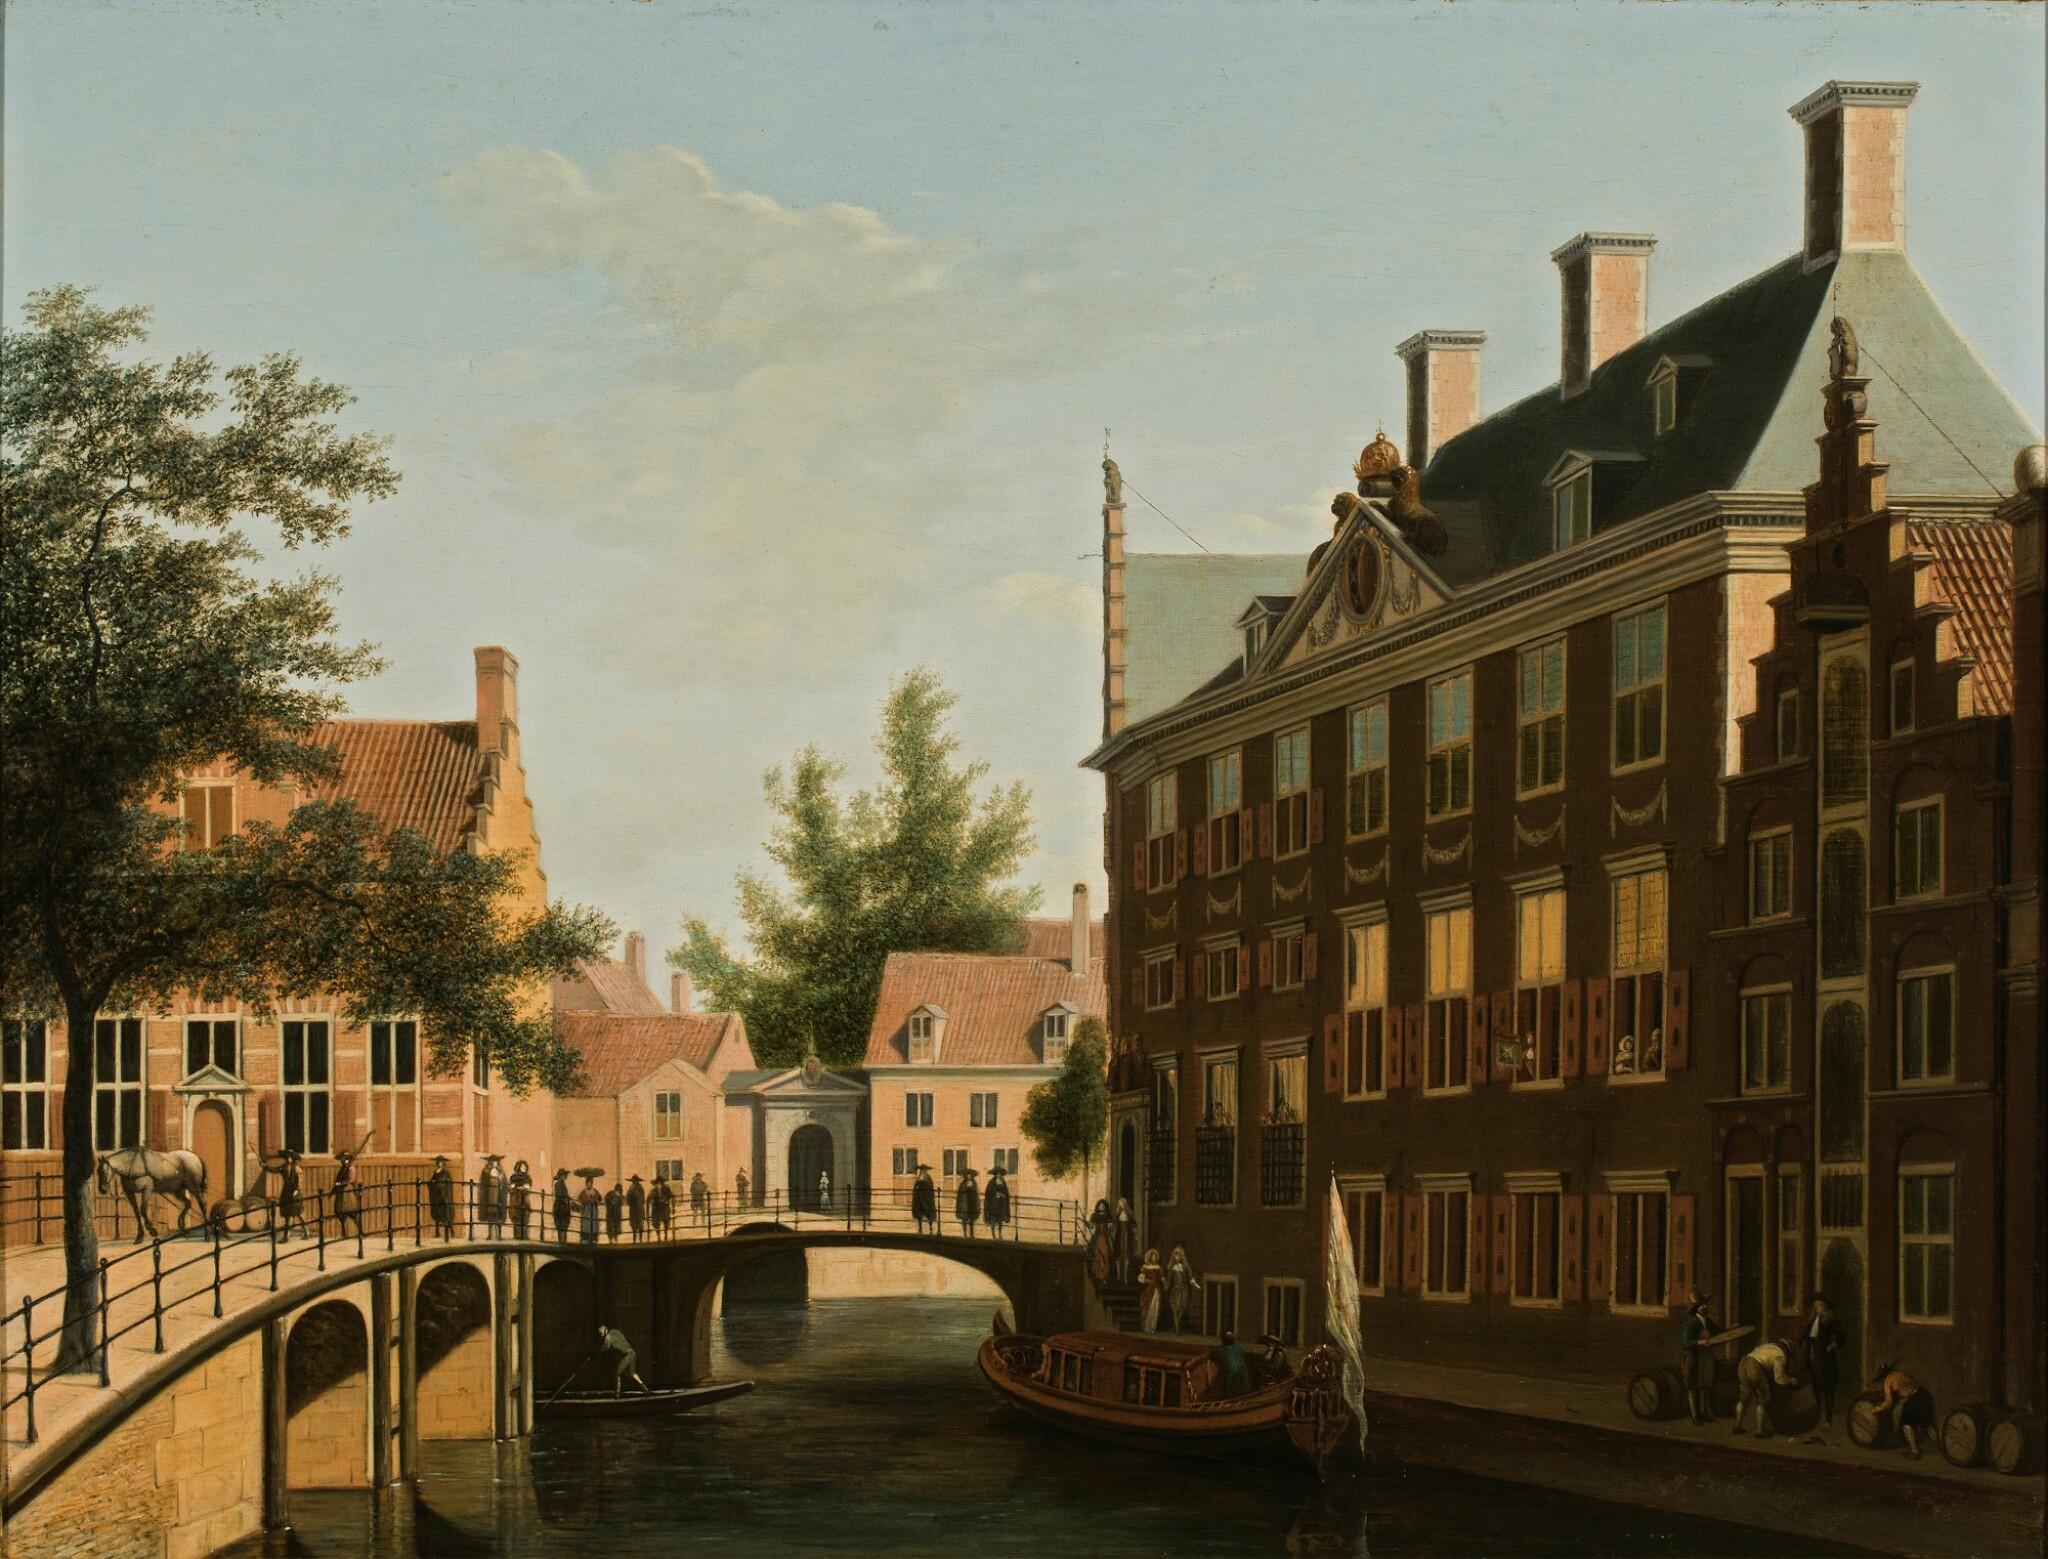 View full screen - View 1 of Lot 36. The Oudezijds Heerenlogement, on the confluence of the Grimburgwal and the Oudezijds Voorburgwal, Amsterdam | 《烏德齊耶茲・希倫胡辛旅館,格林伯格瓦爾運河與奧德澤茲・沃爾伯格瓦運河交匯處,阿姆斯特丹》.